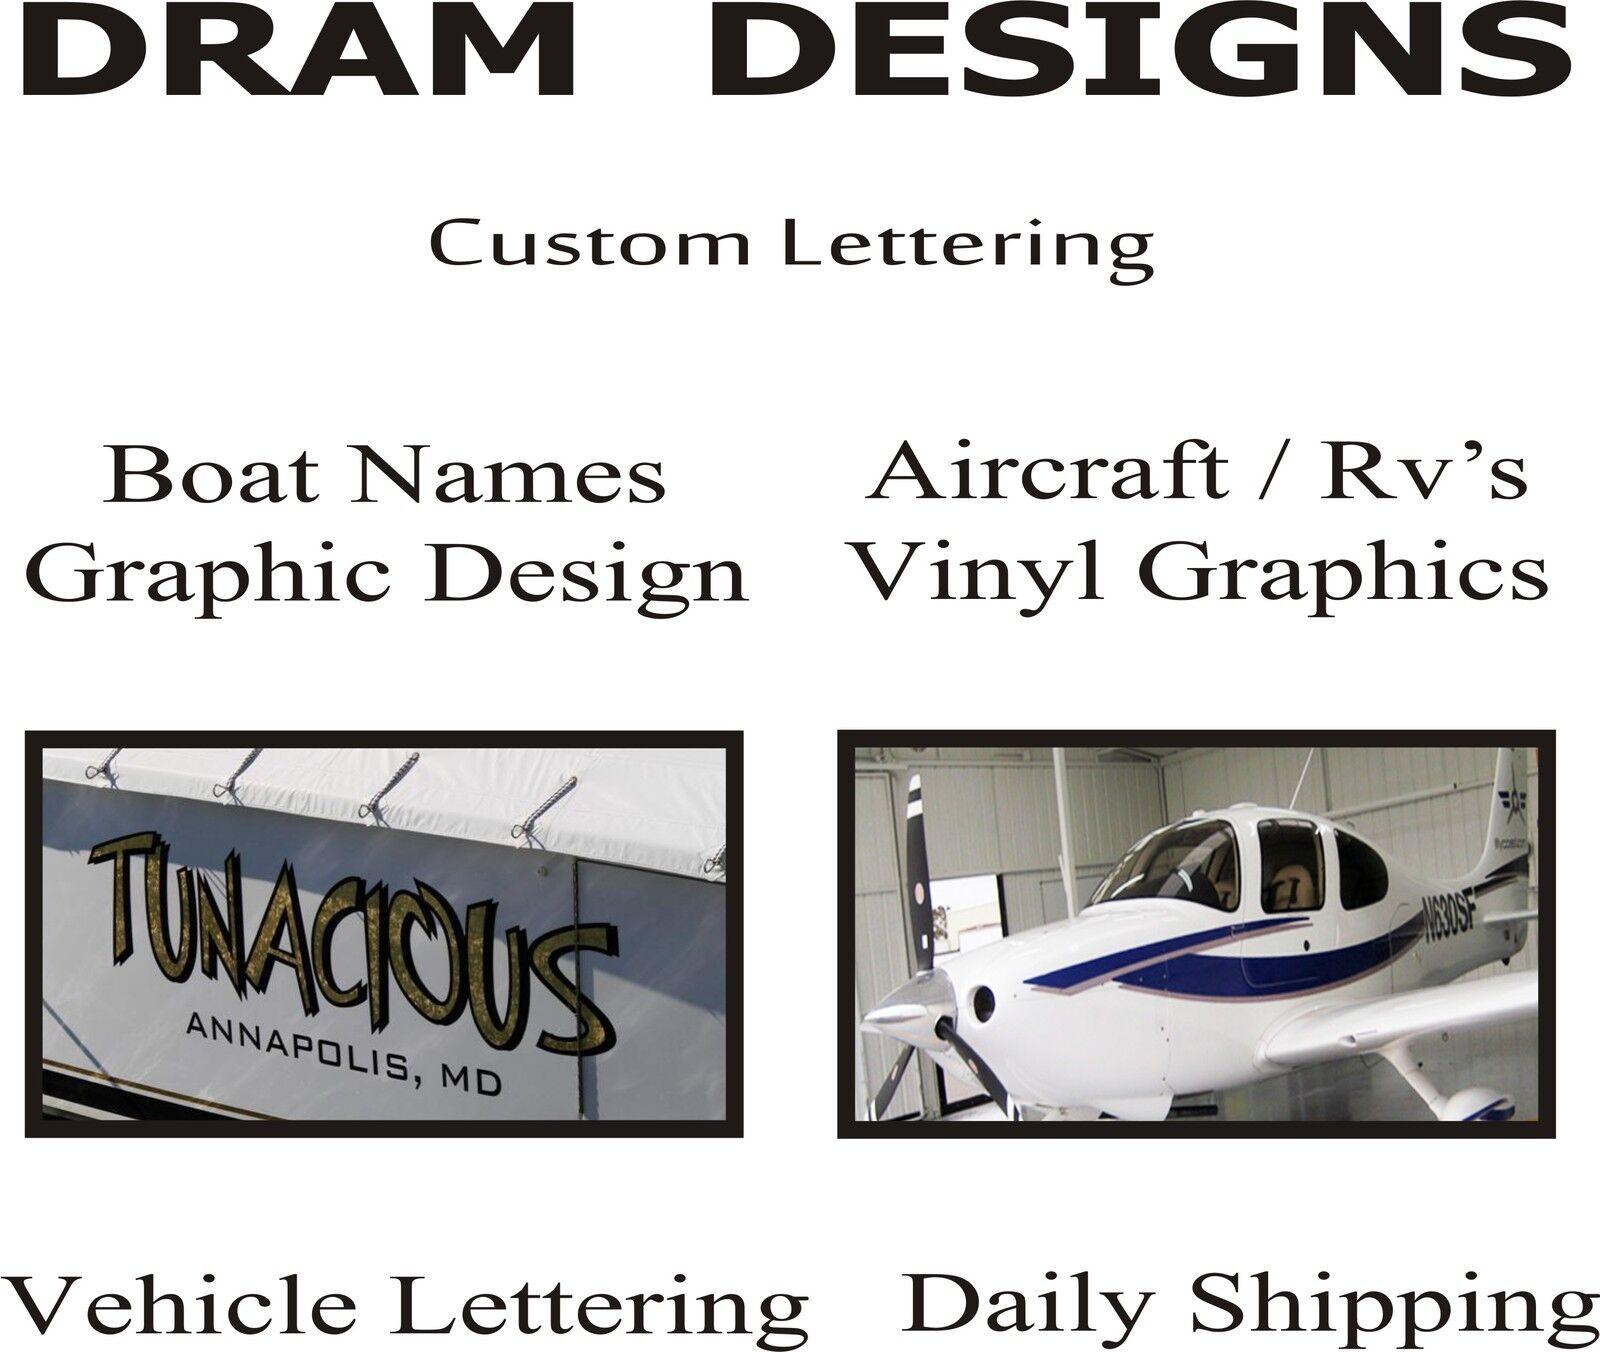 Dram Designs